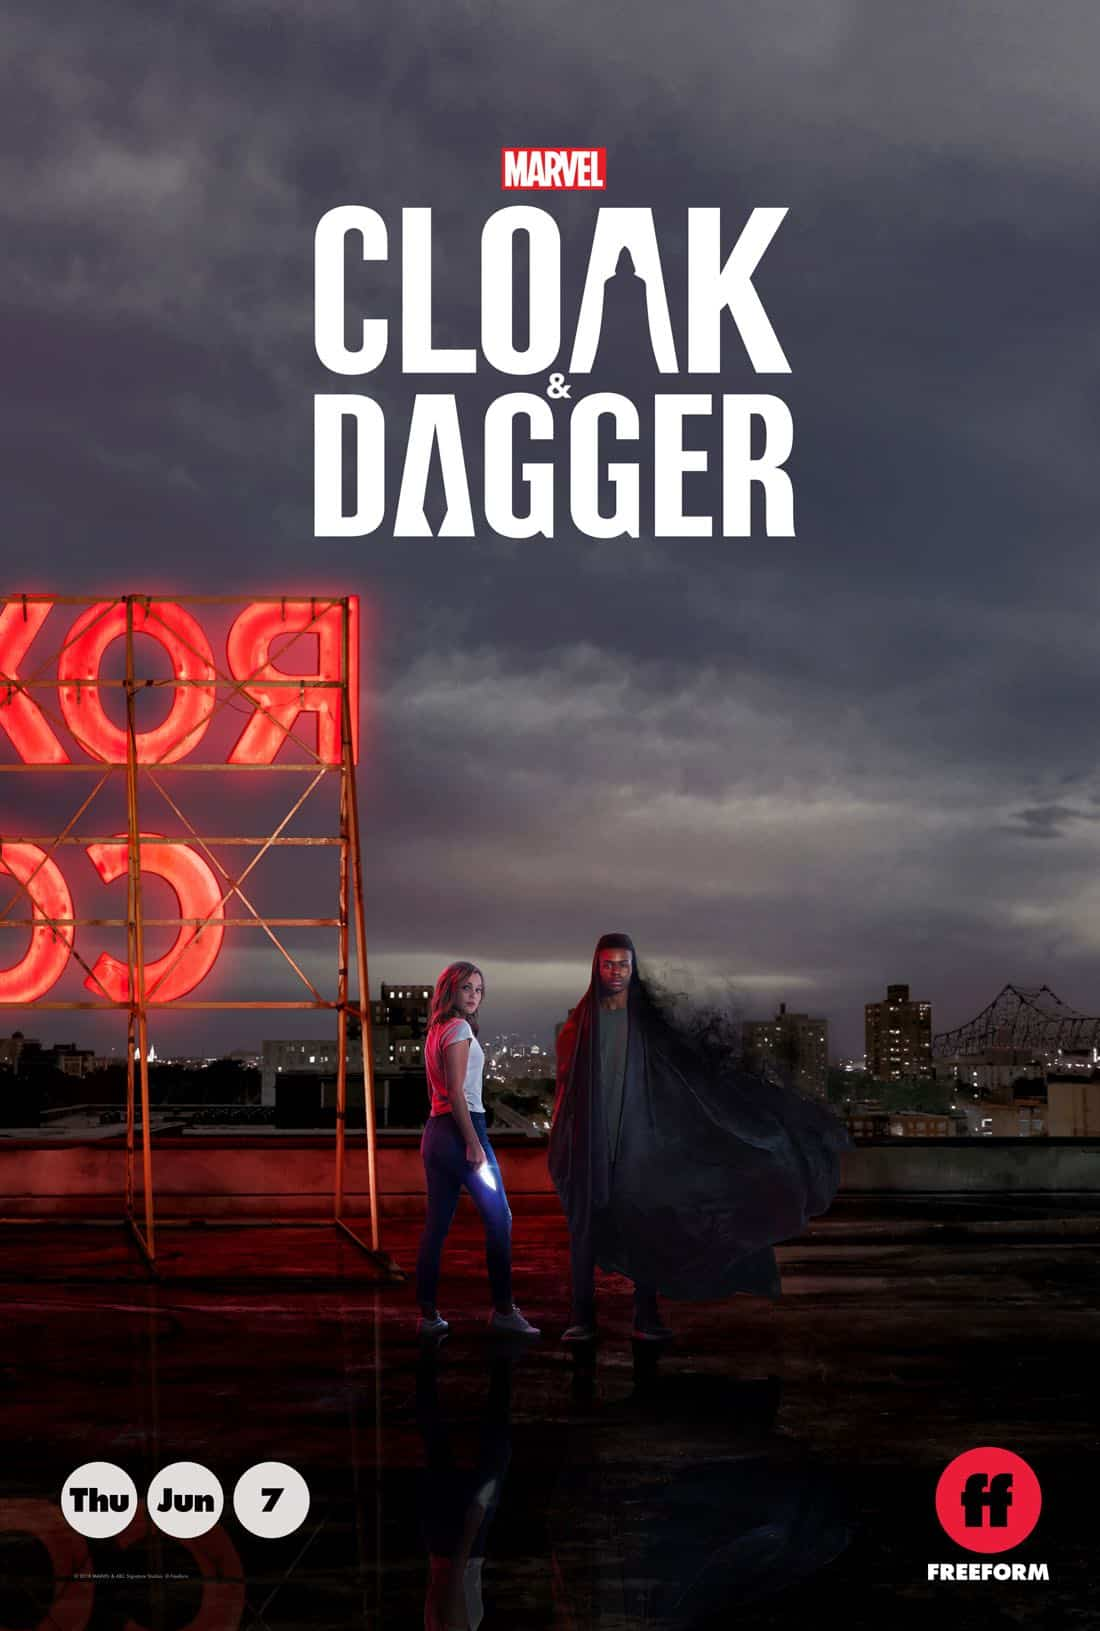 Cloak & Dagger (Freeform)